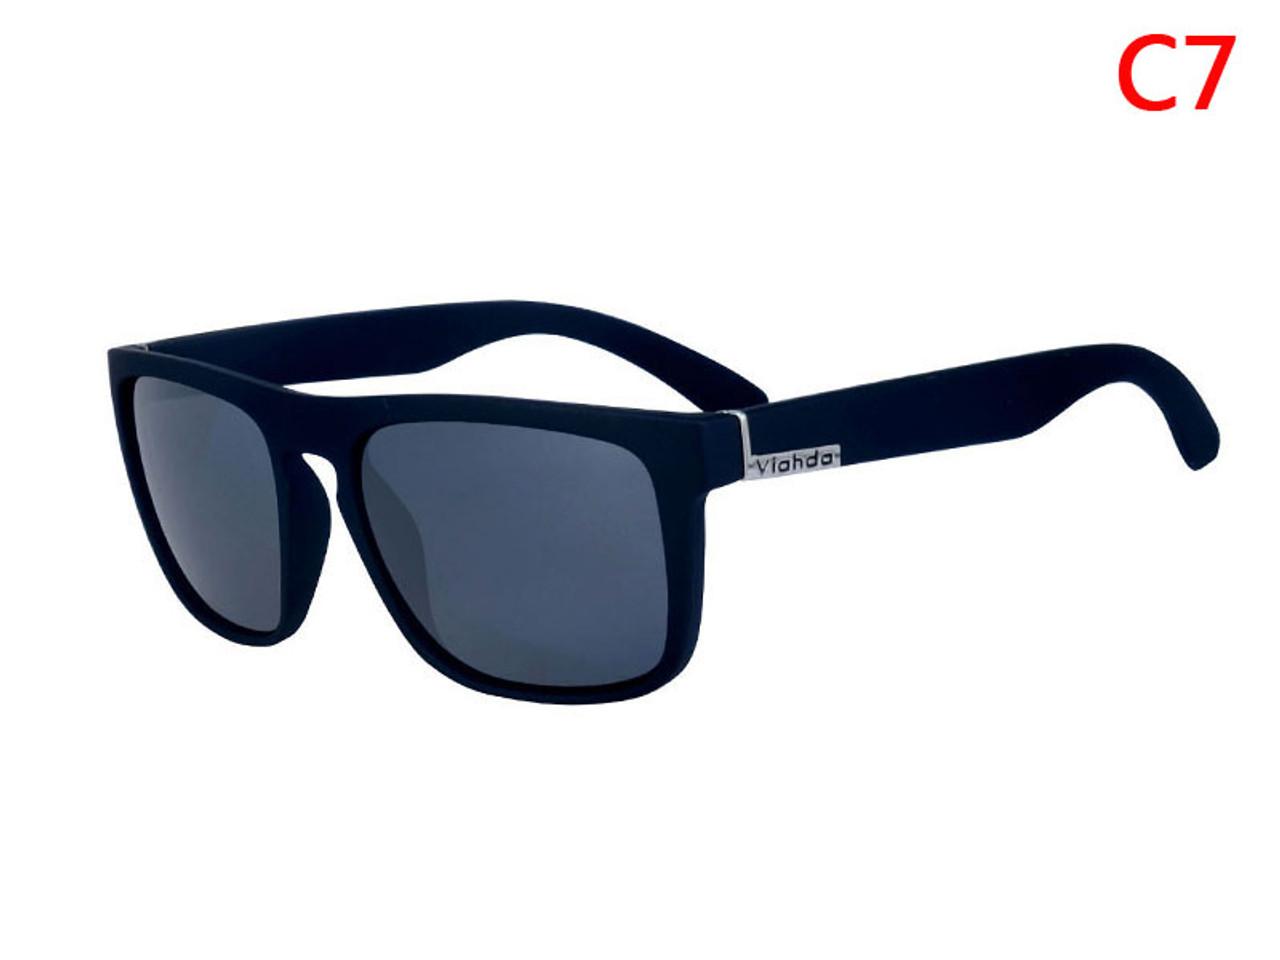 dc1bf8dff5c81 ... Viahda 2017 new and coolest Sunglasses Sport Sun Glasses Fishing  Eyeglasses Oculos De Sol Masculino With ...